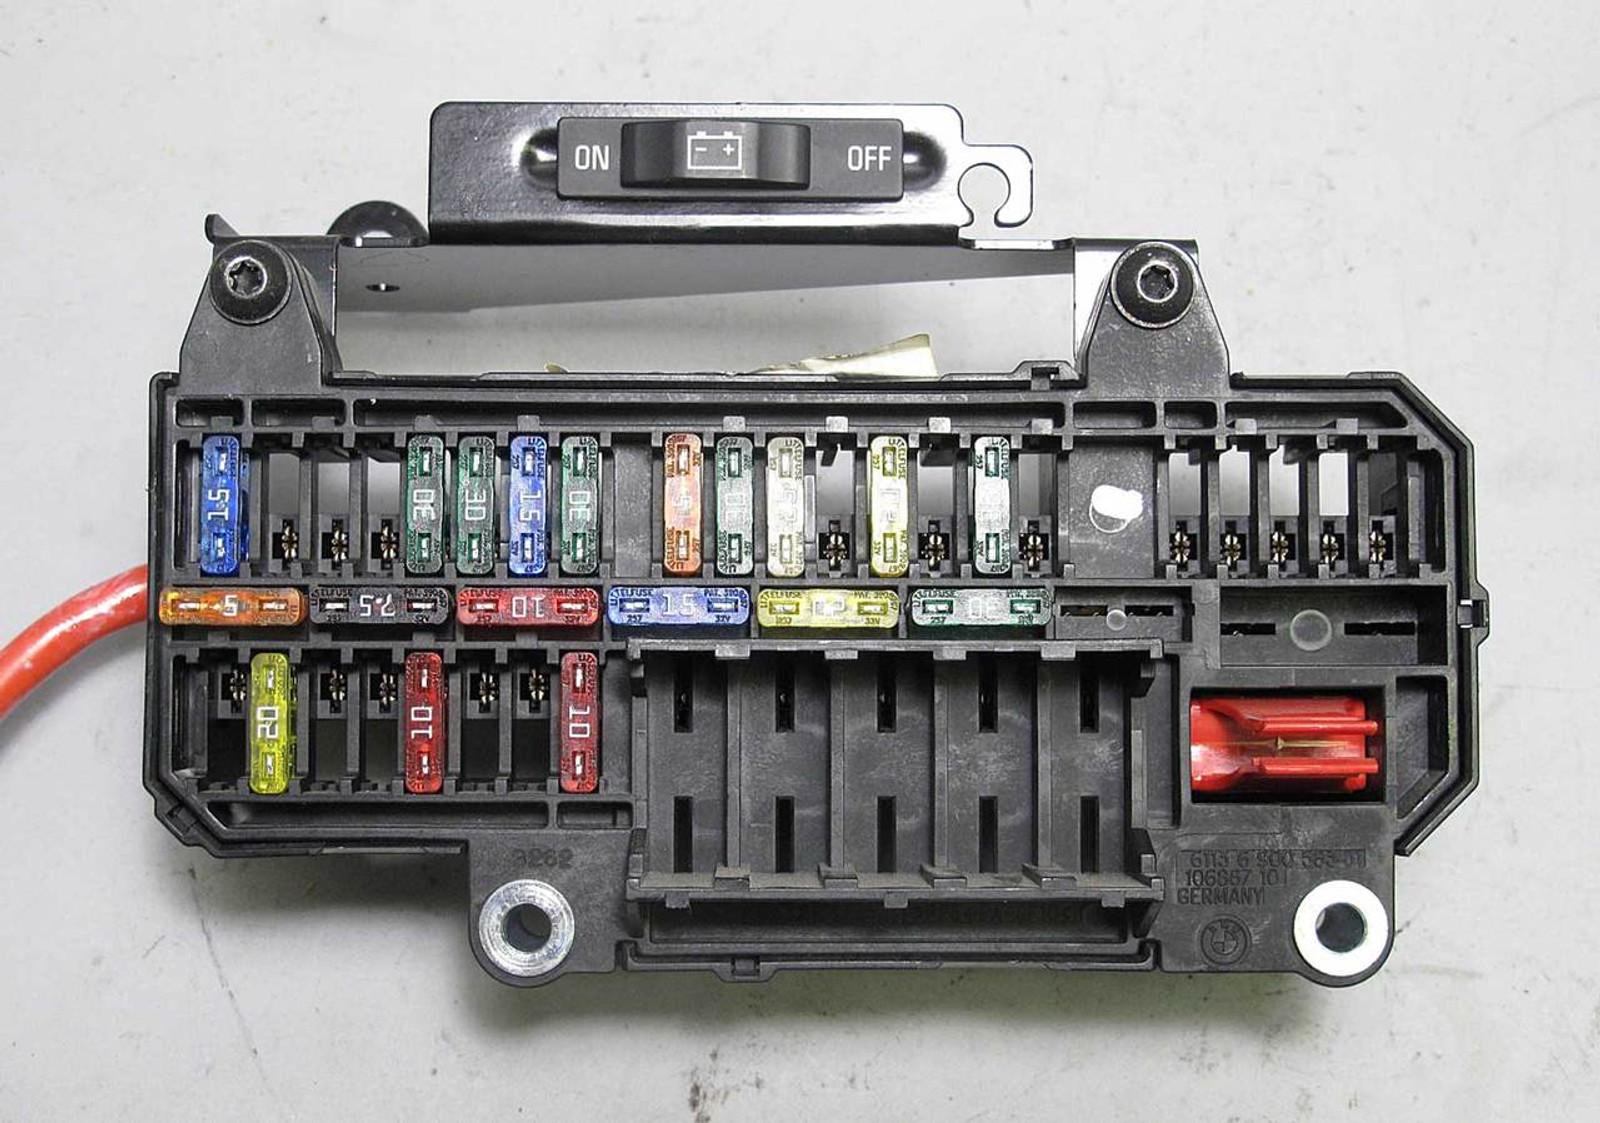 2002 bmw 7 series fuse box diy enthusiasts wiring diagrams u2022 2008 bmw fuse box [ 1280 x 898 Pixel ]